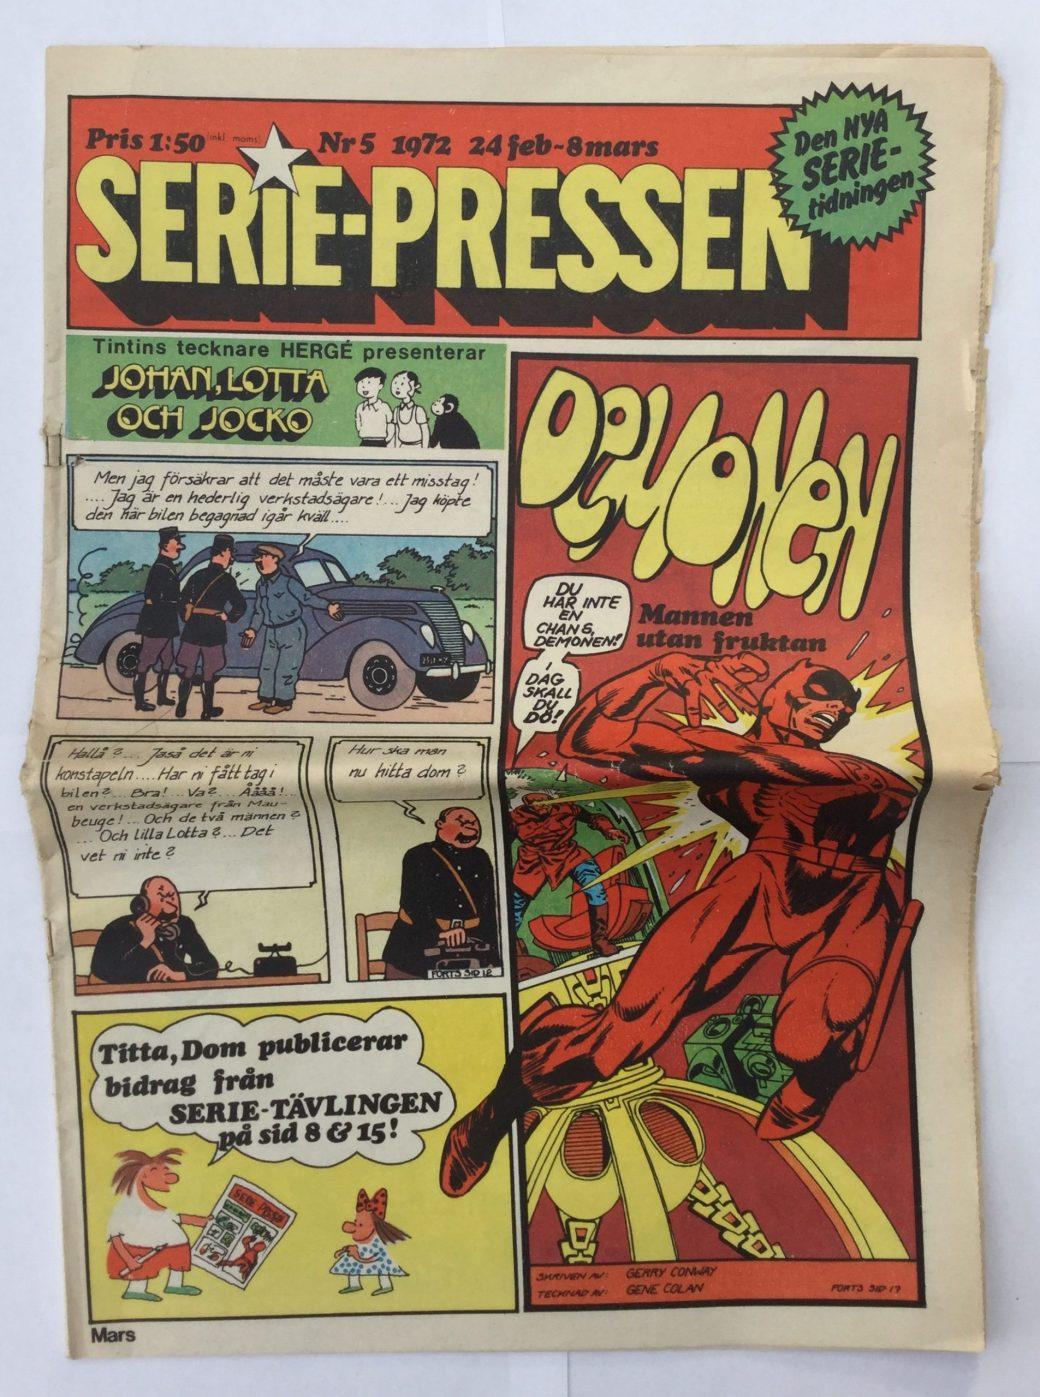 Serie-Pressen nr 5, 1972 i tabloidformat